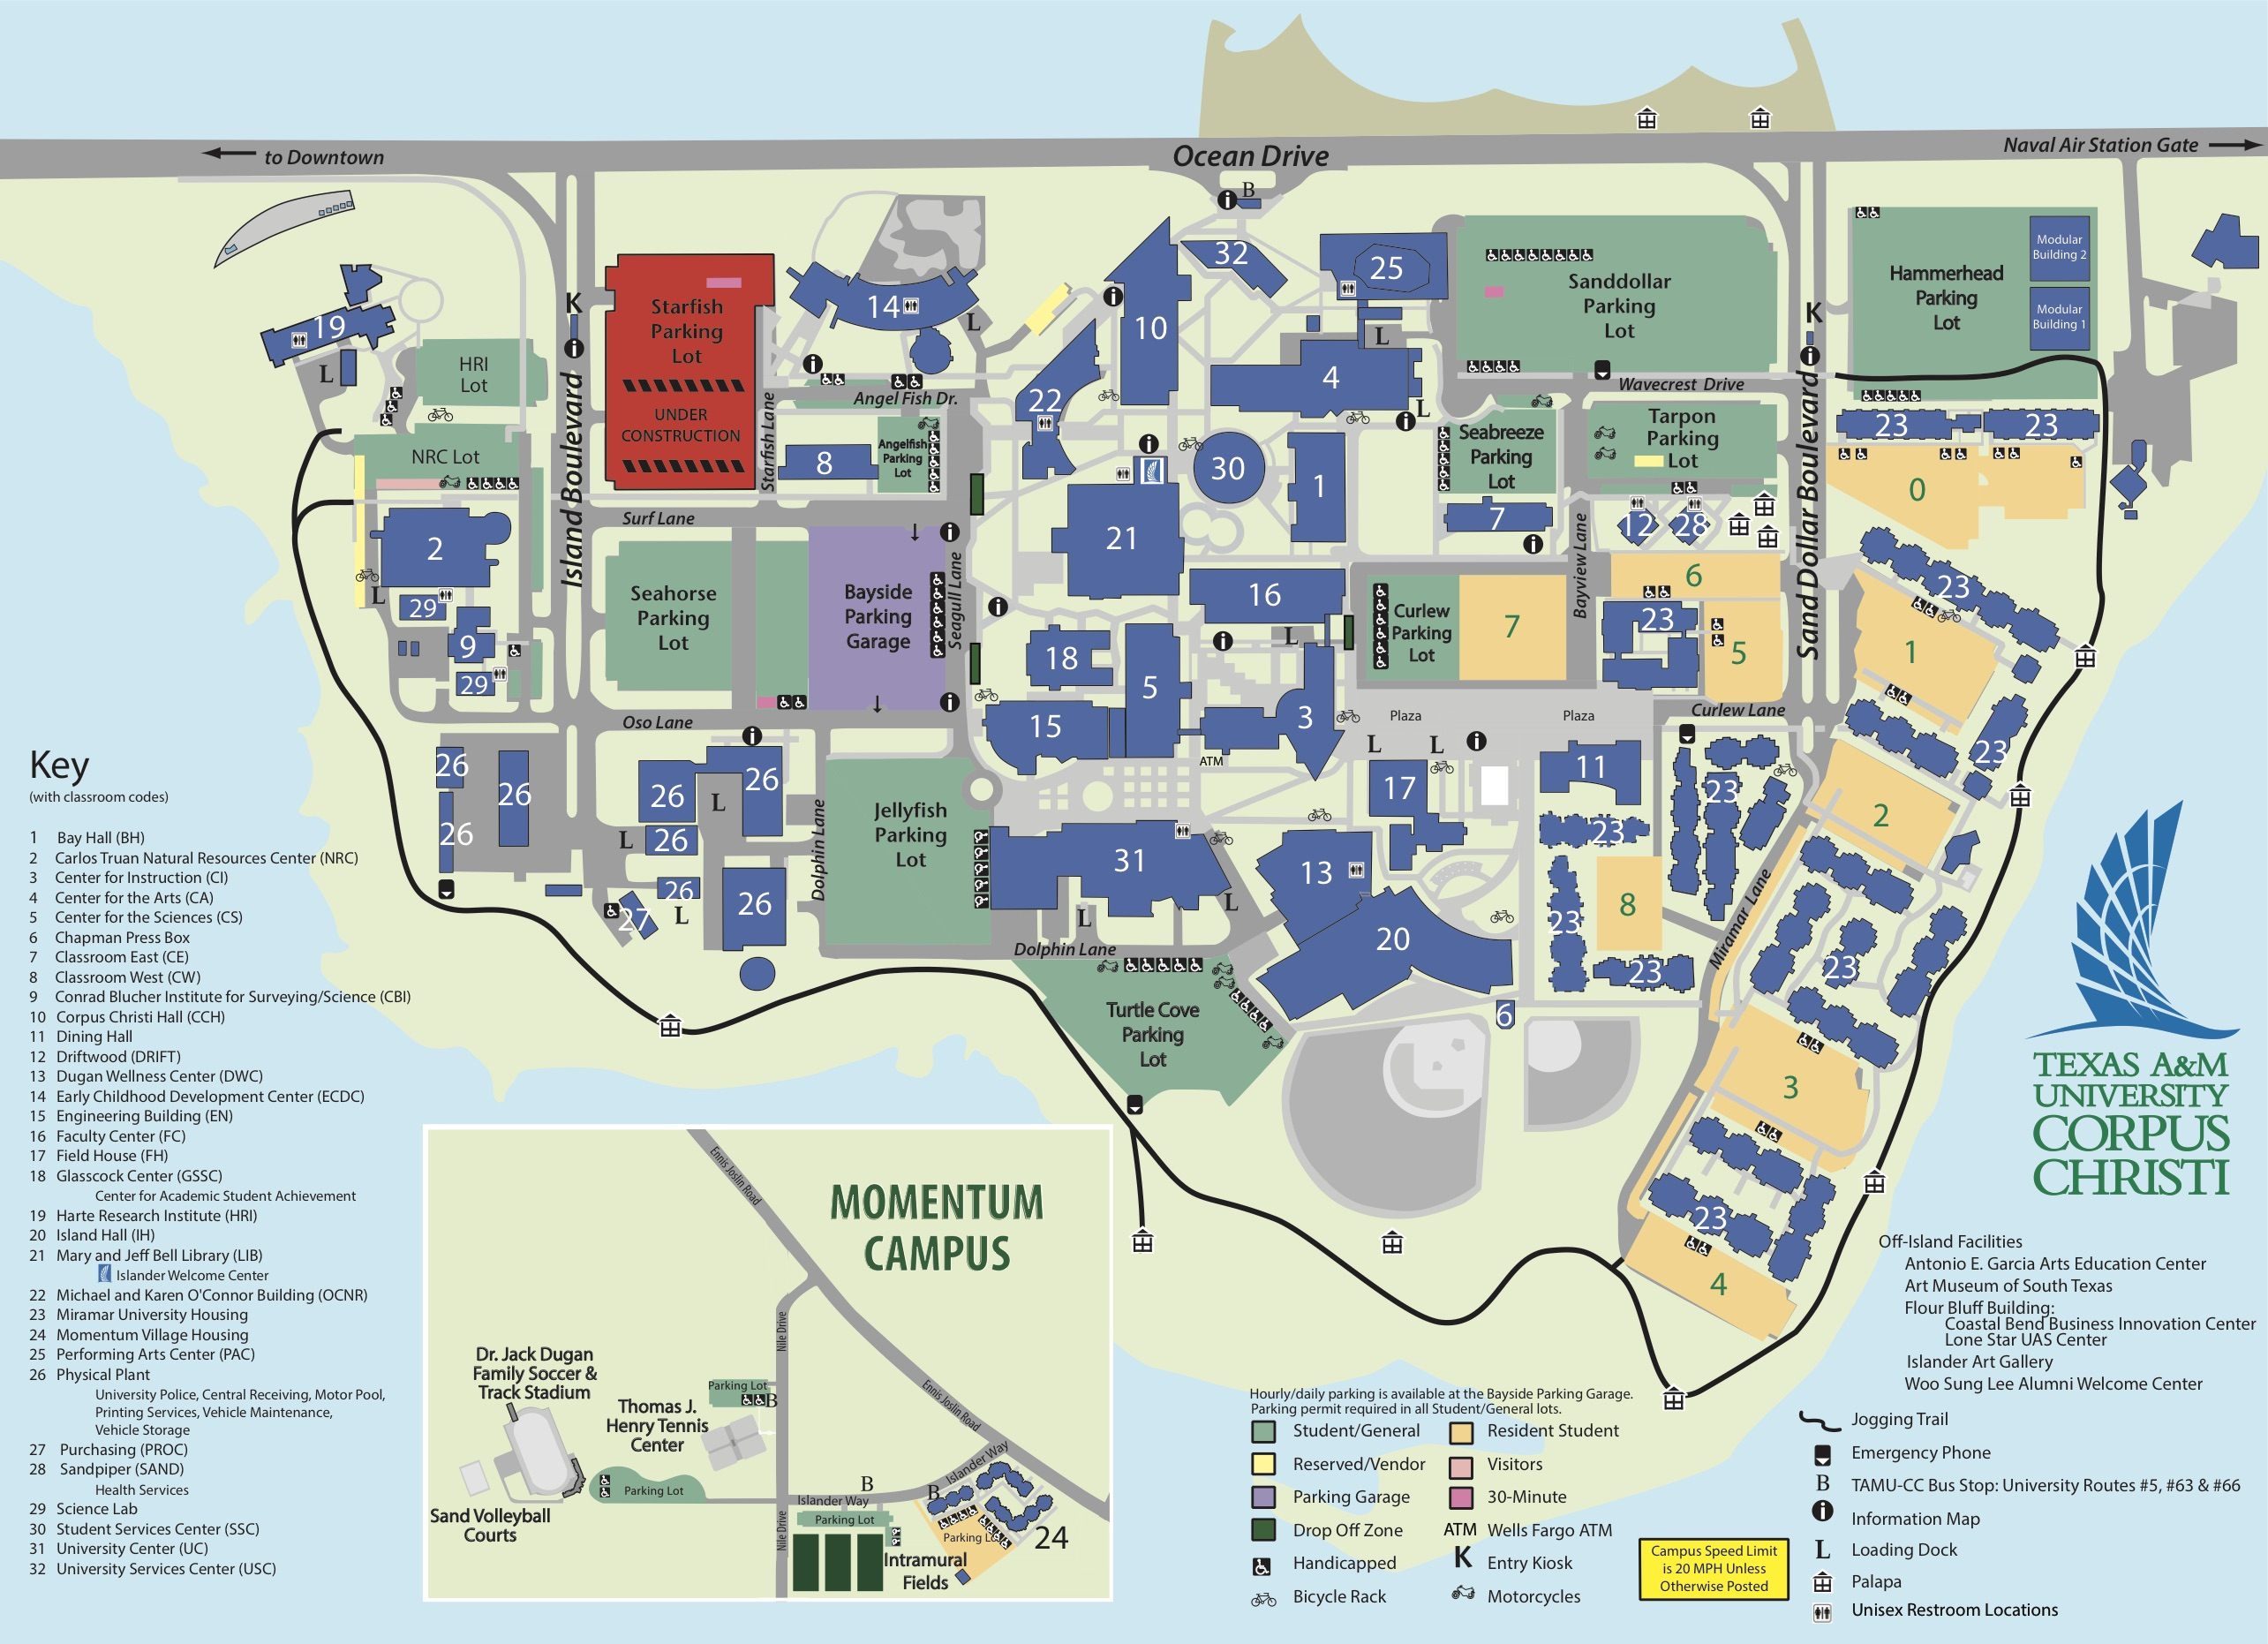 Campus Map Texas A&m University-Corpus Christi - Texas A&m Housing Map